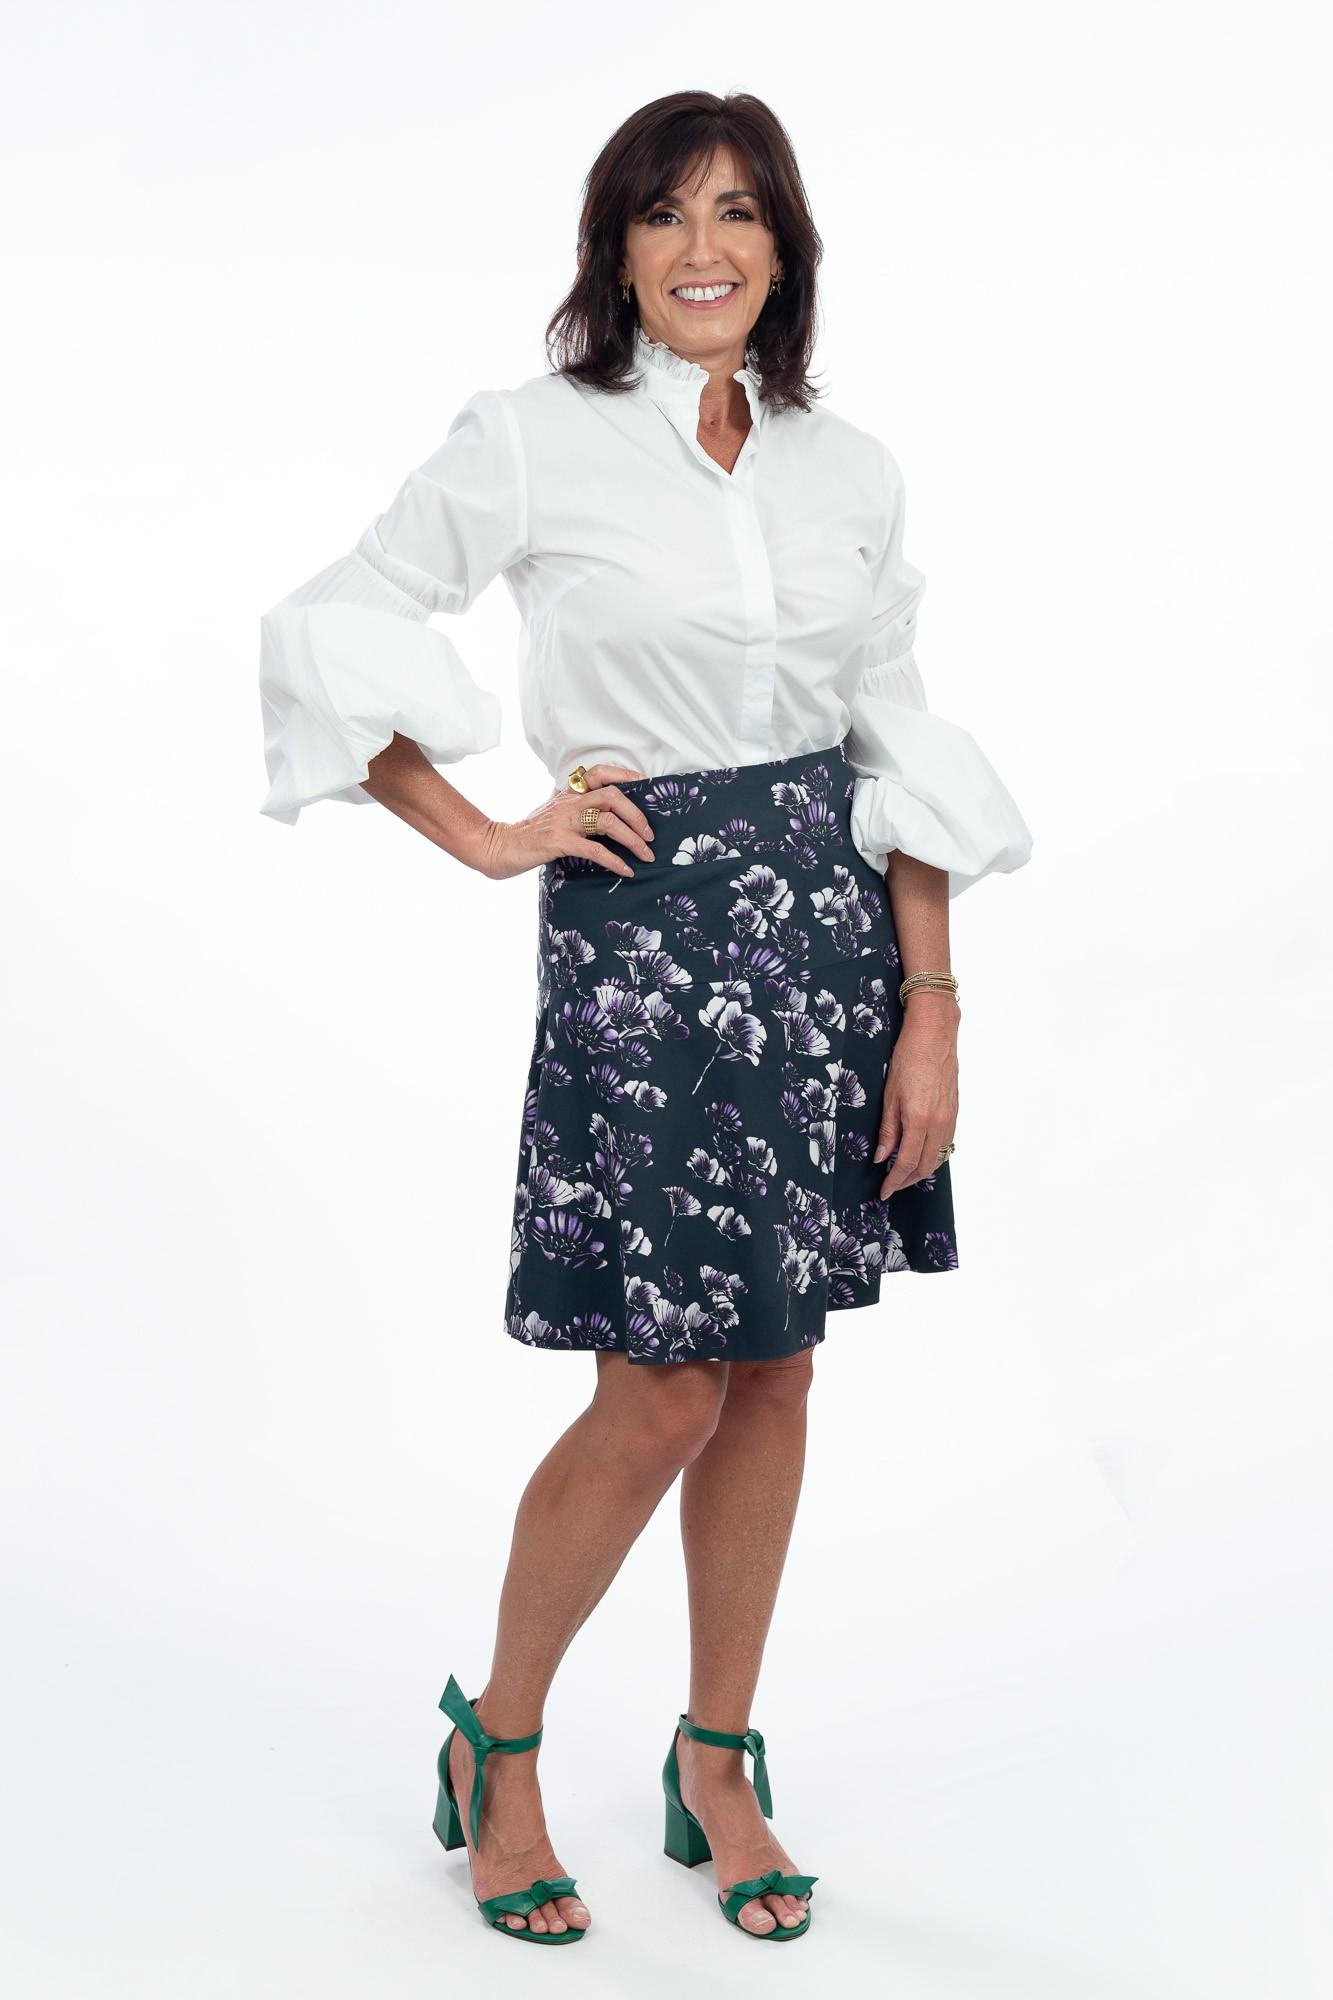 Camisa off white babados/elástico Letícia Gonzaga tam 40